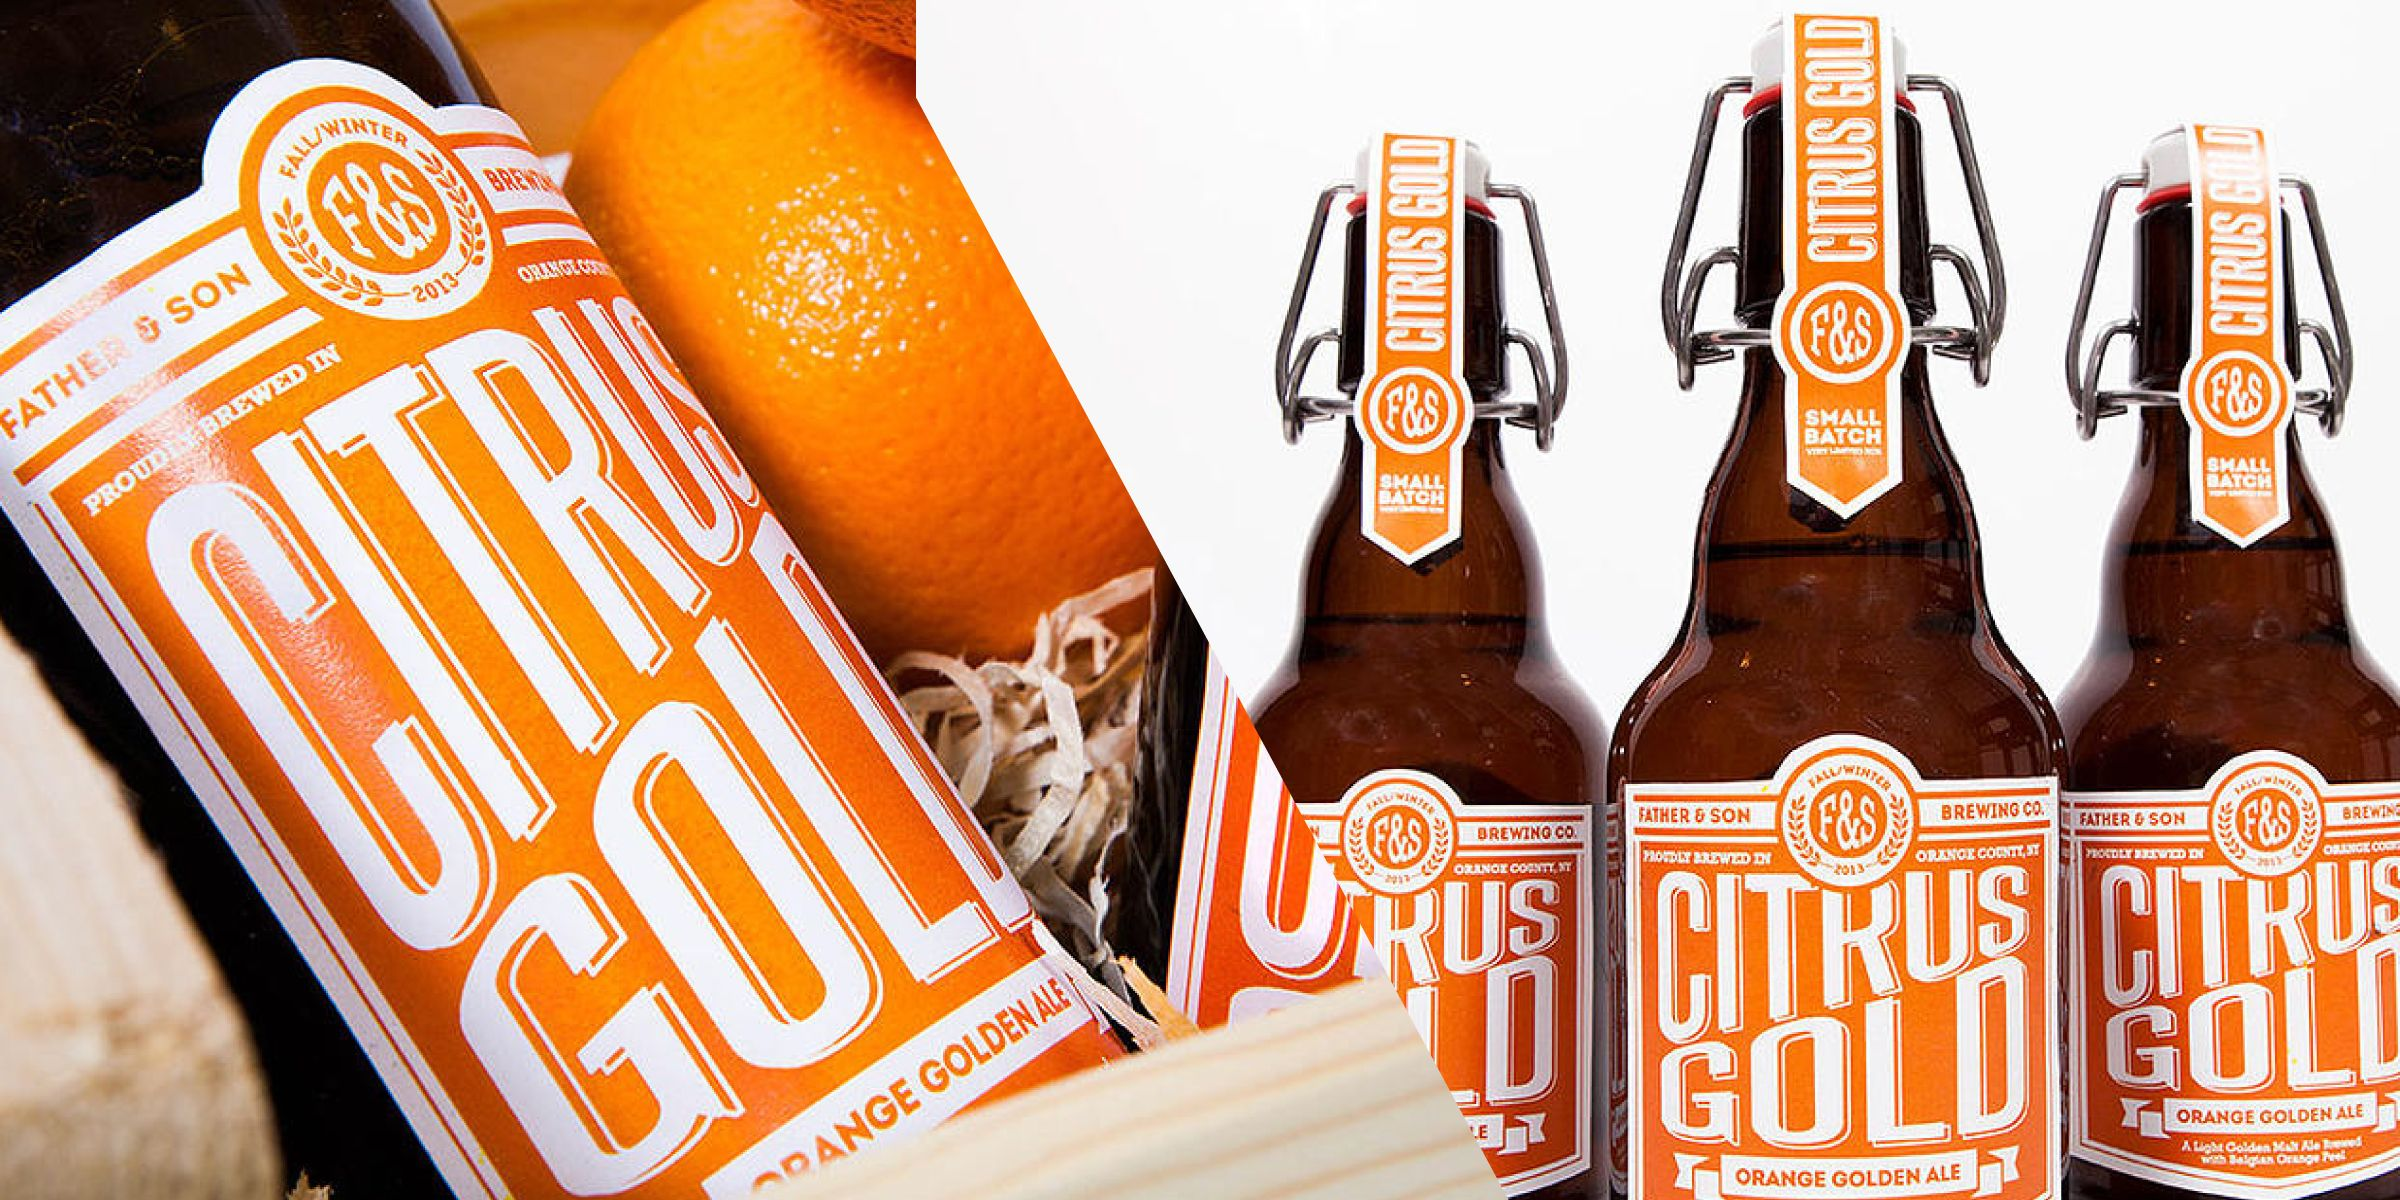 Father & Son Brewing Company: Citrus Gold. - Dieline